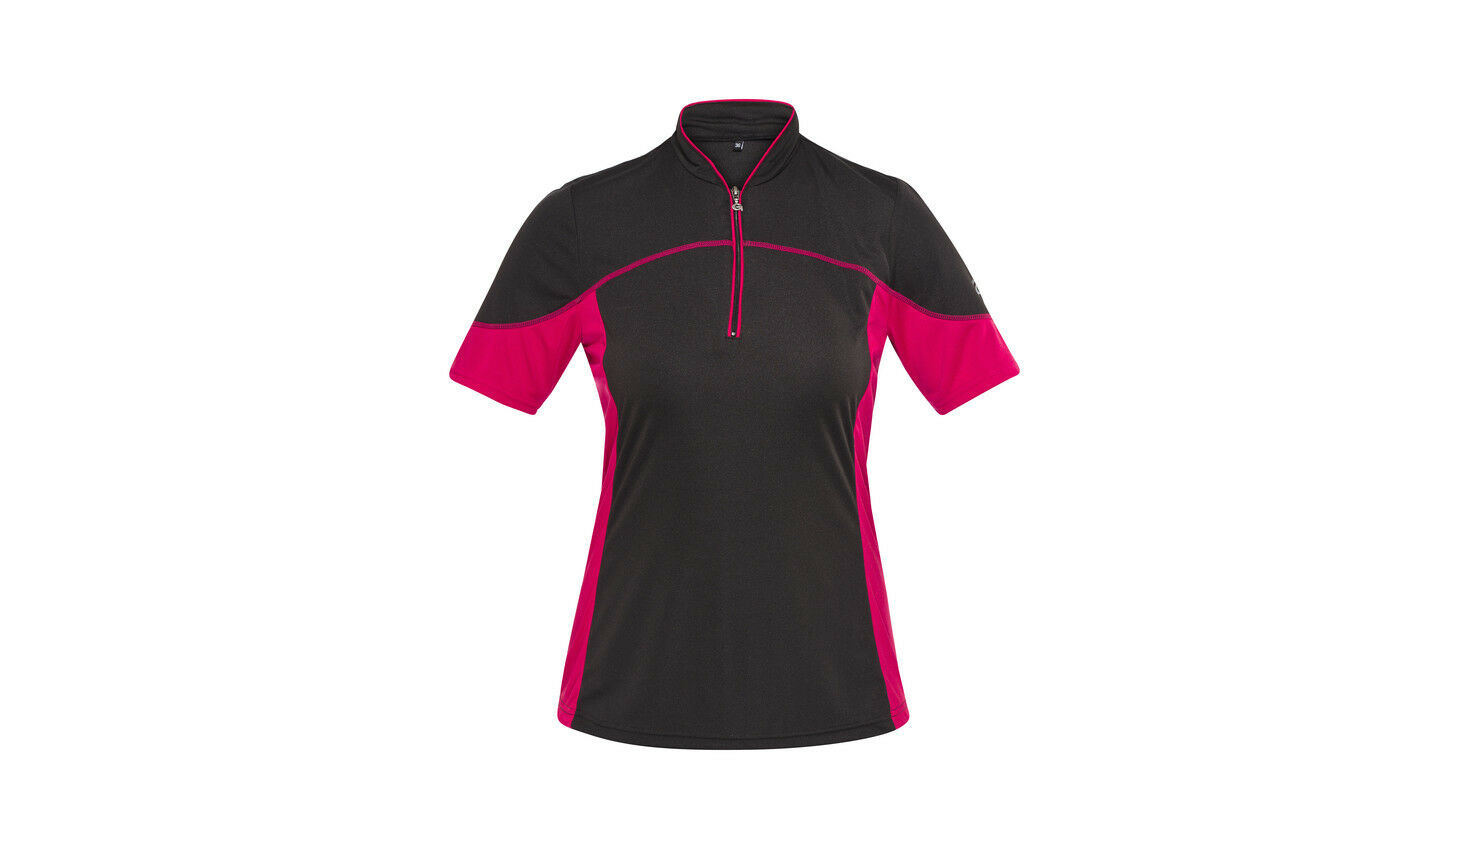 Herren Fahhrad Shirt Trikot funktionell Silver Radsport Protection® Topcool M L XL NEU